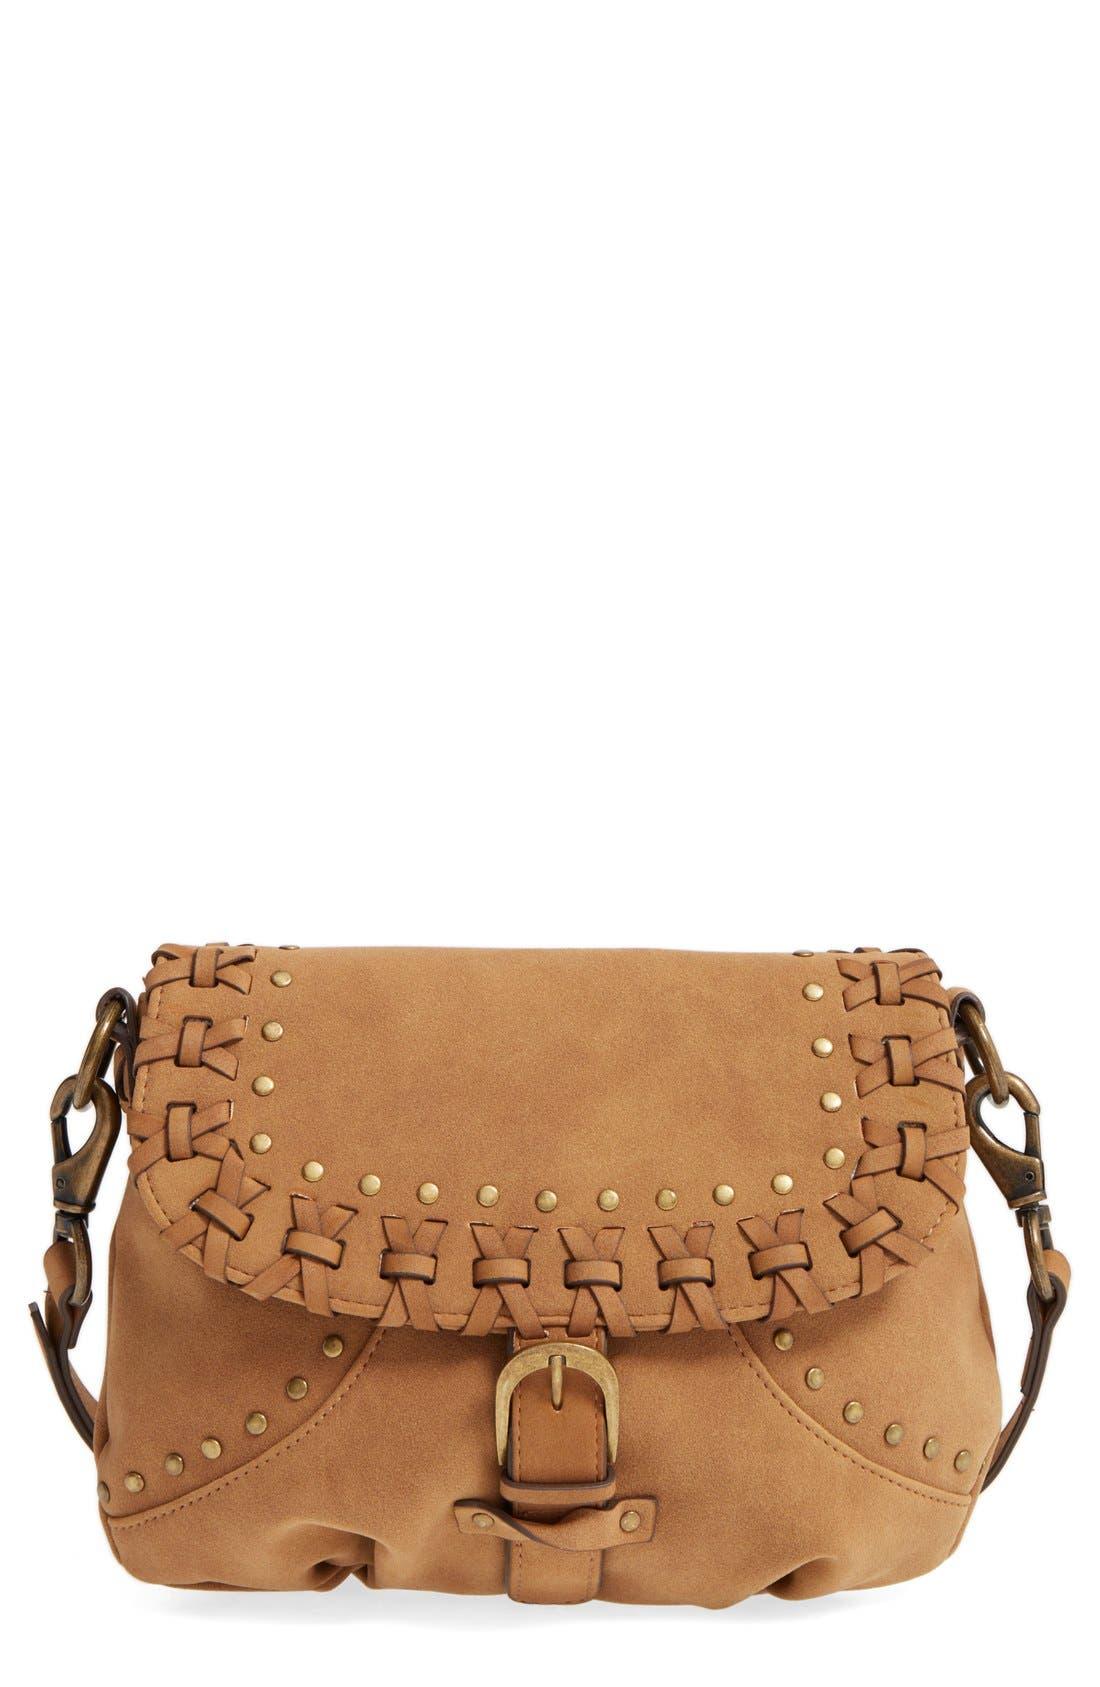 Alternate Image 1 Selected - Elle & Jae Gypset Sevilla Studded Faux Suede Crossbody Bag